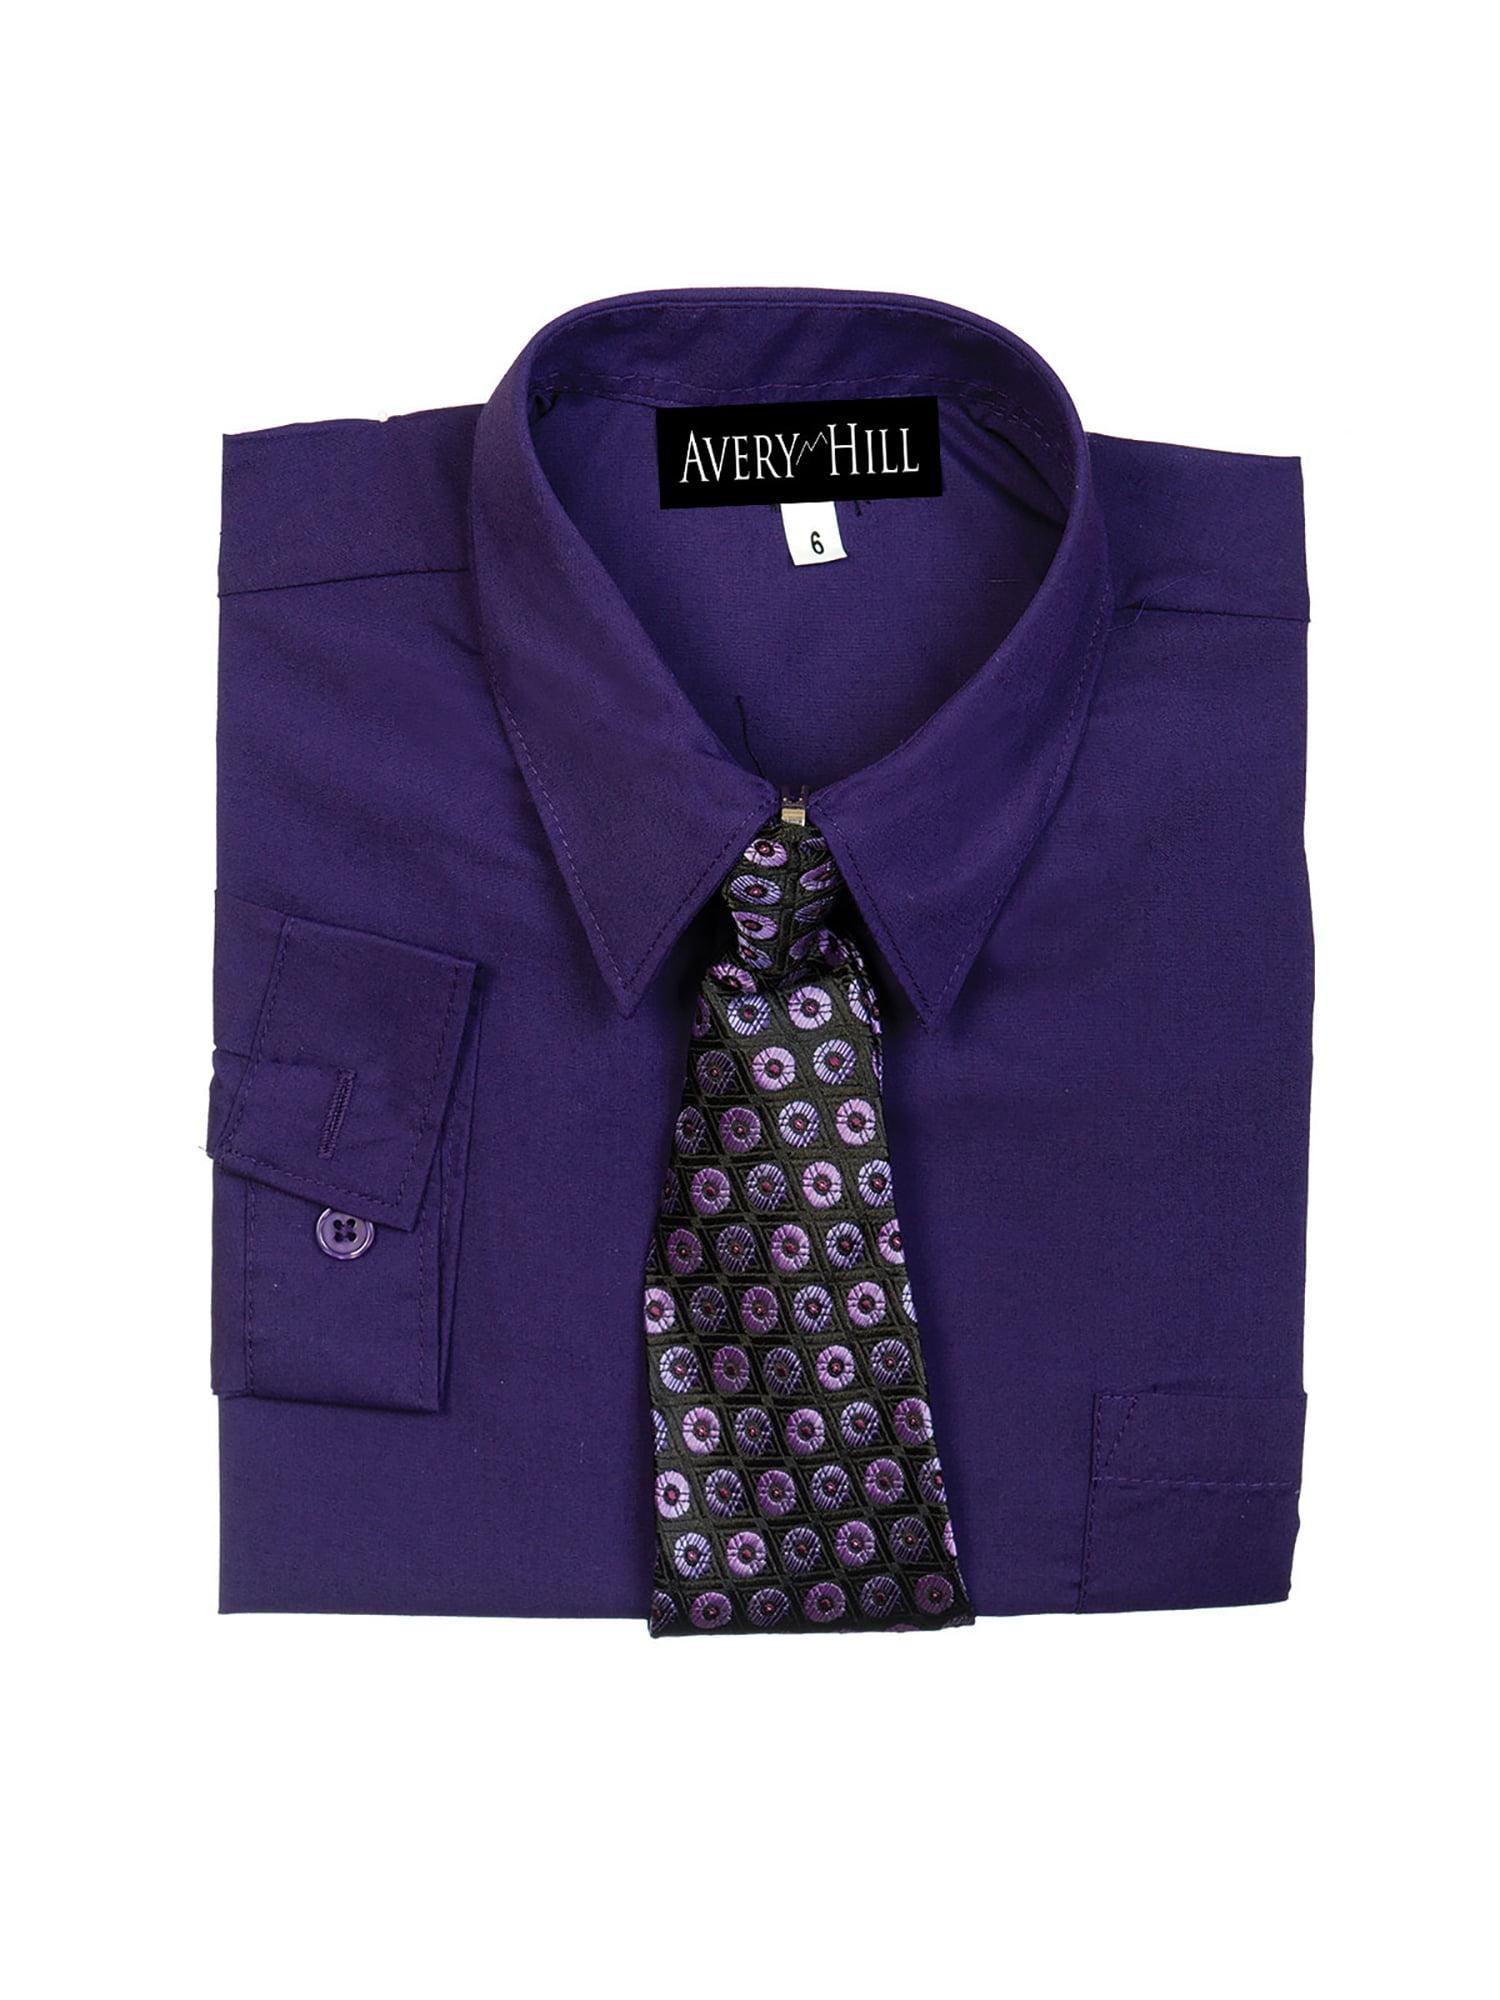 Boys Young Kings $35 Lilac Ash Long Sleeve Dress Shirt w// Tie Sizes 8-20